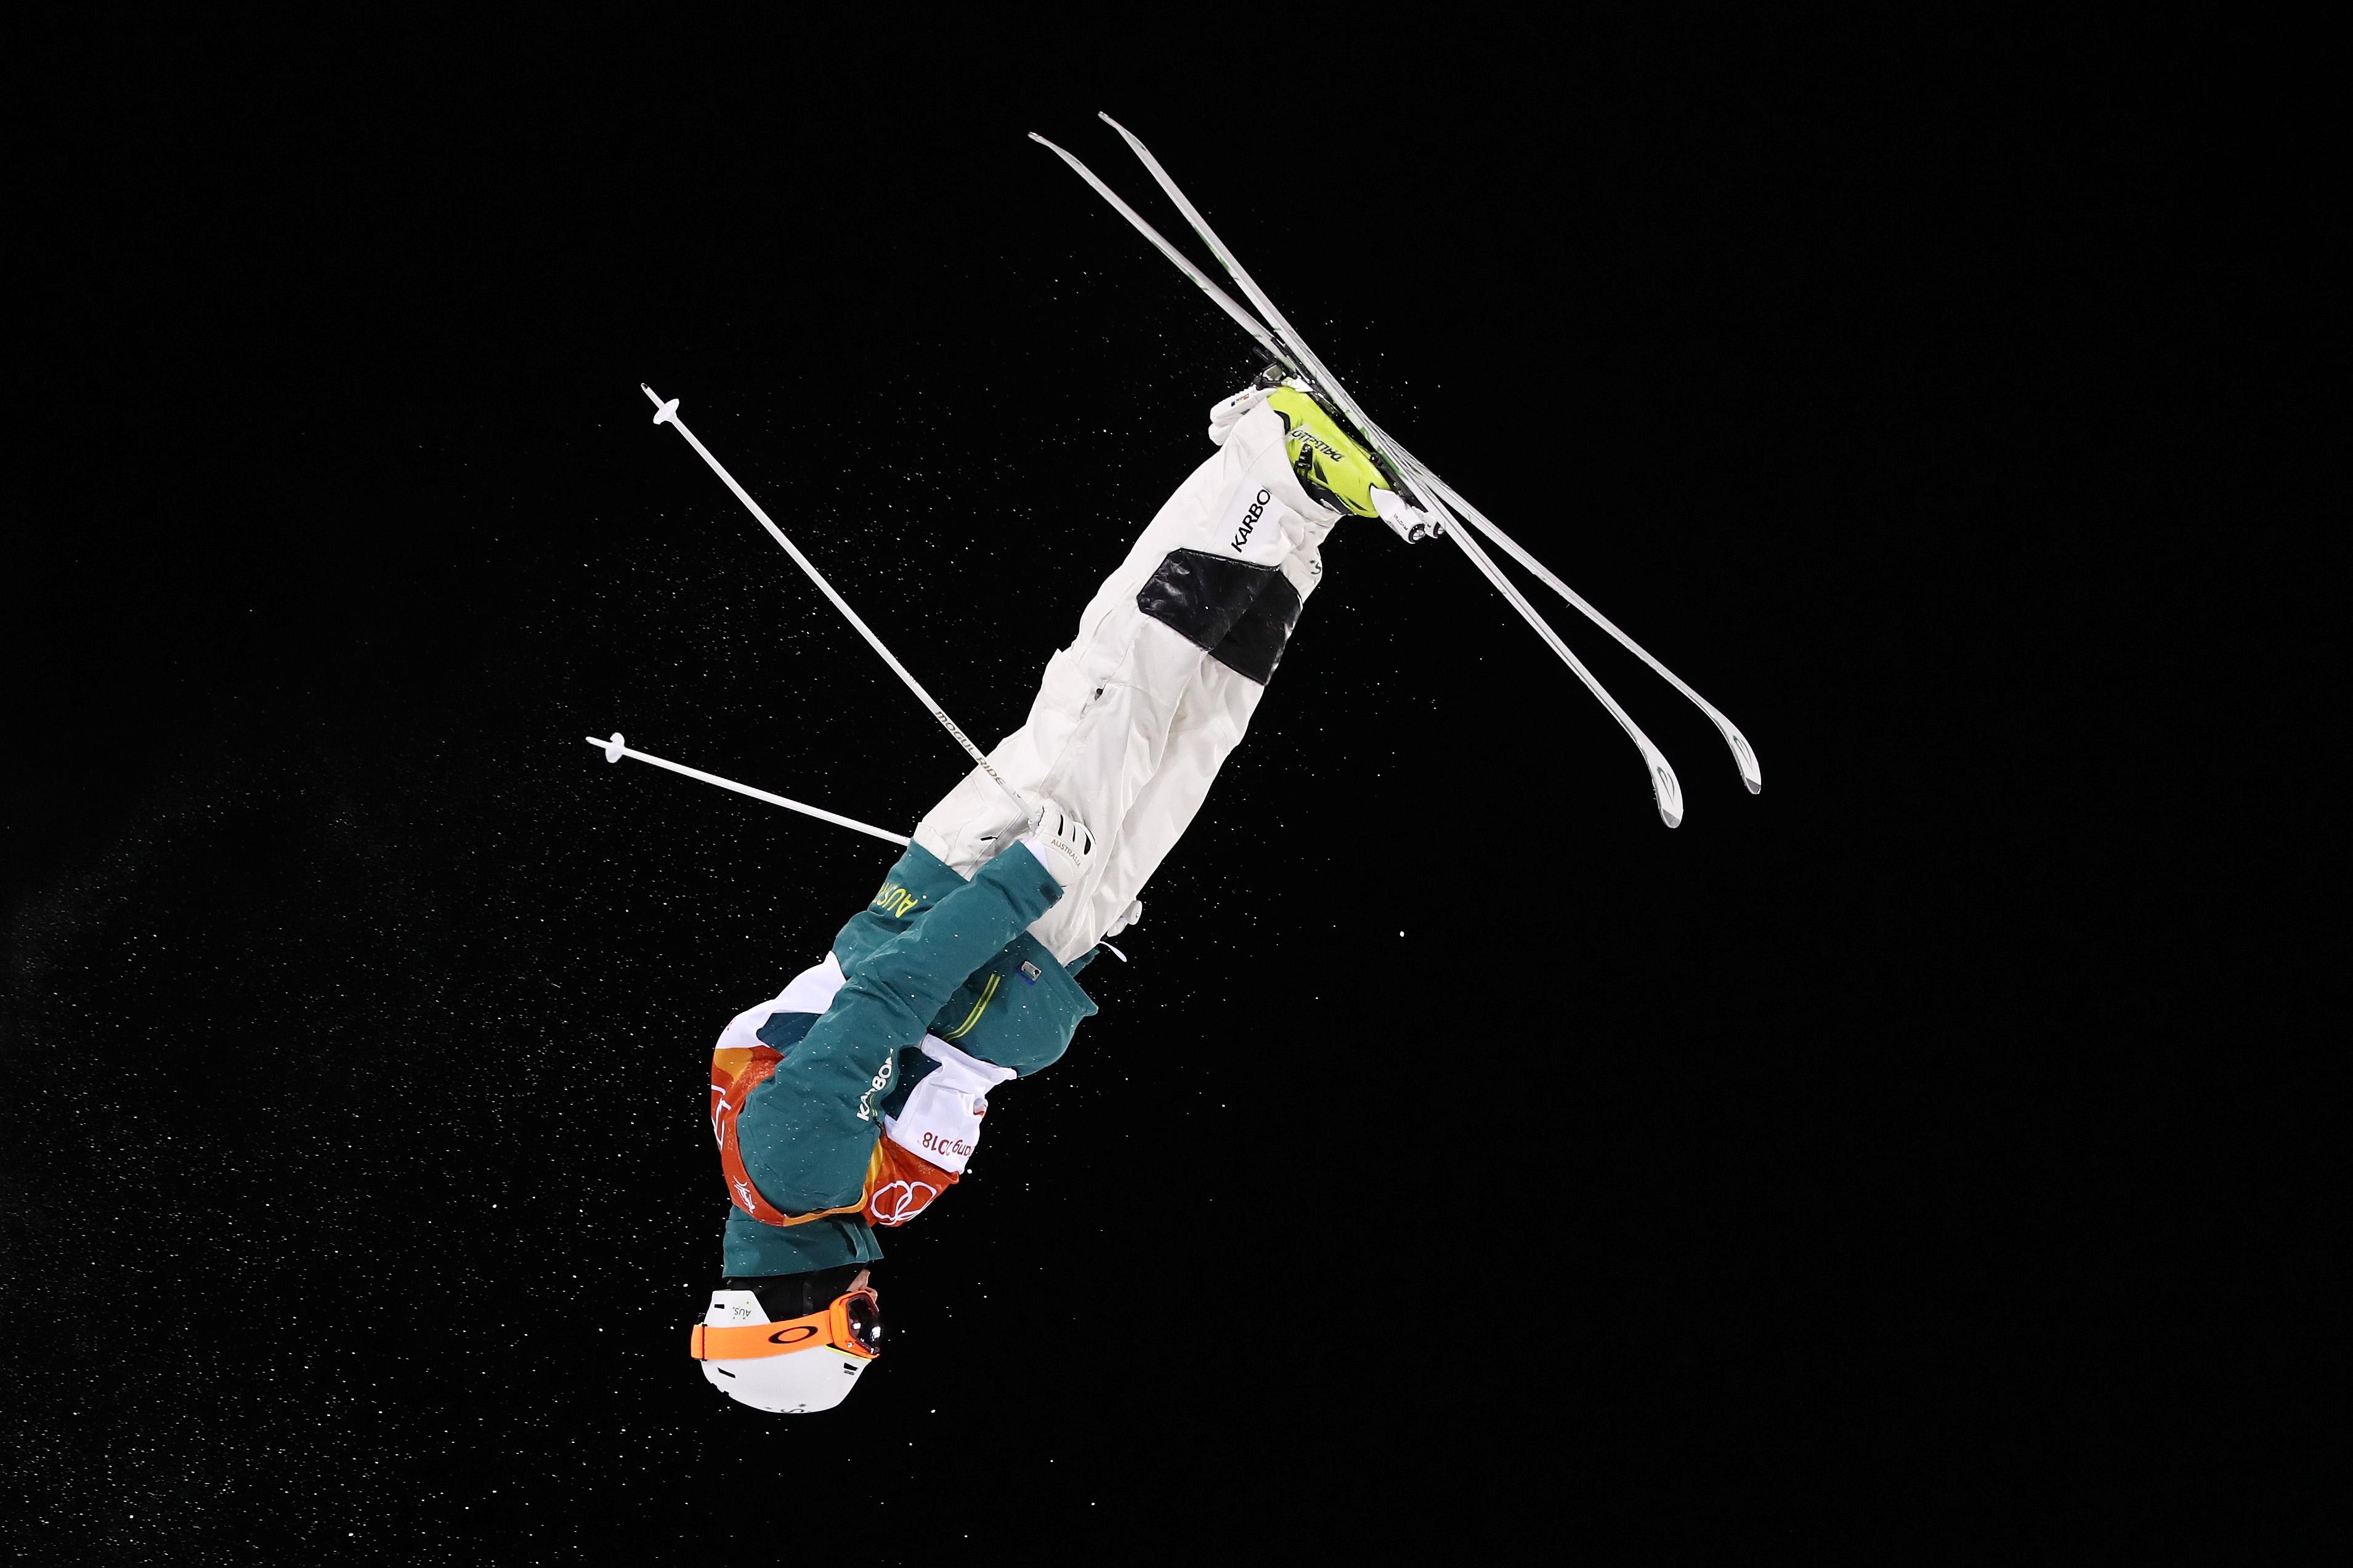 Freestyle skiing: Kingsbury seals long-awaited moguls crown